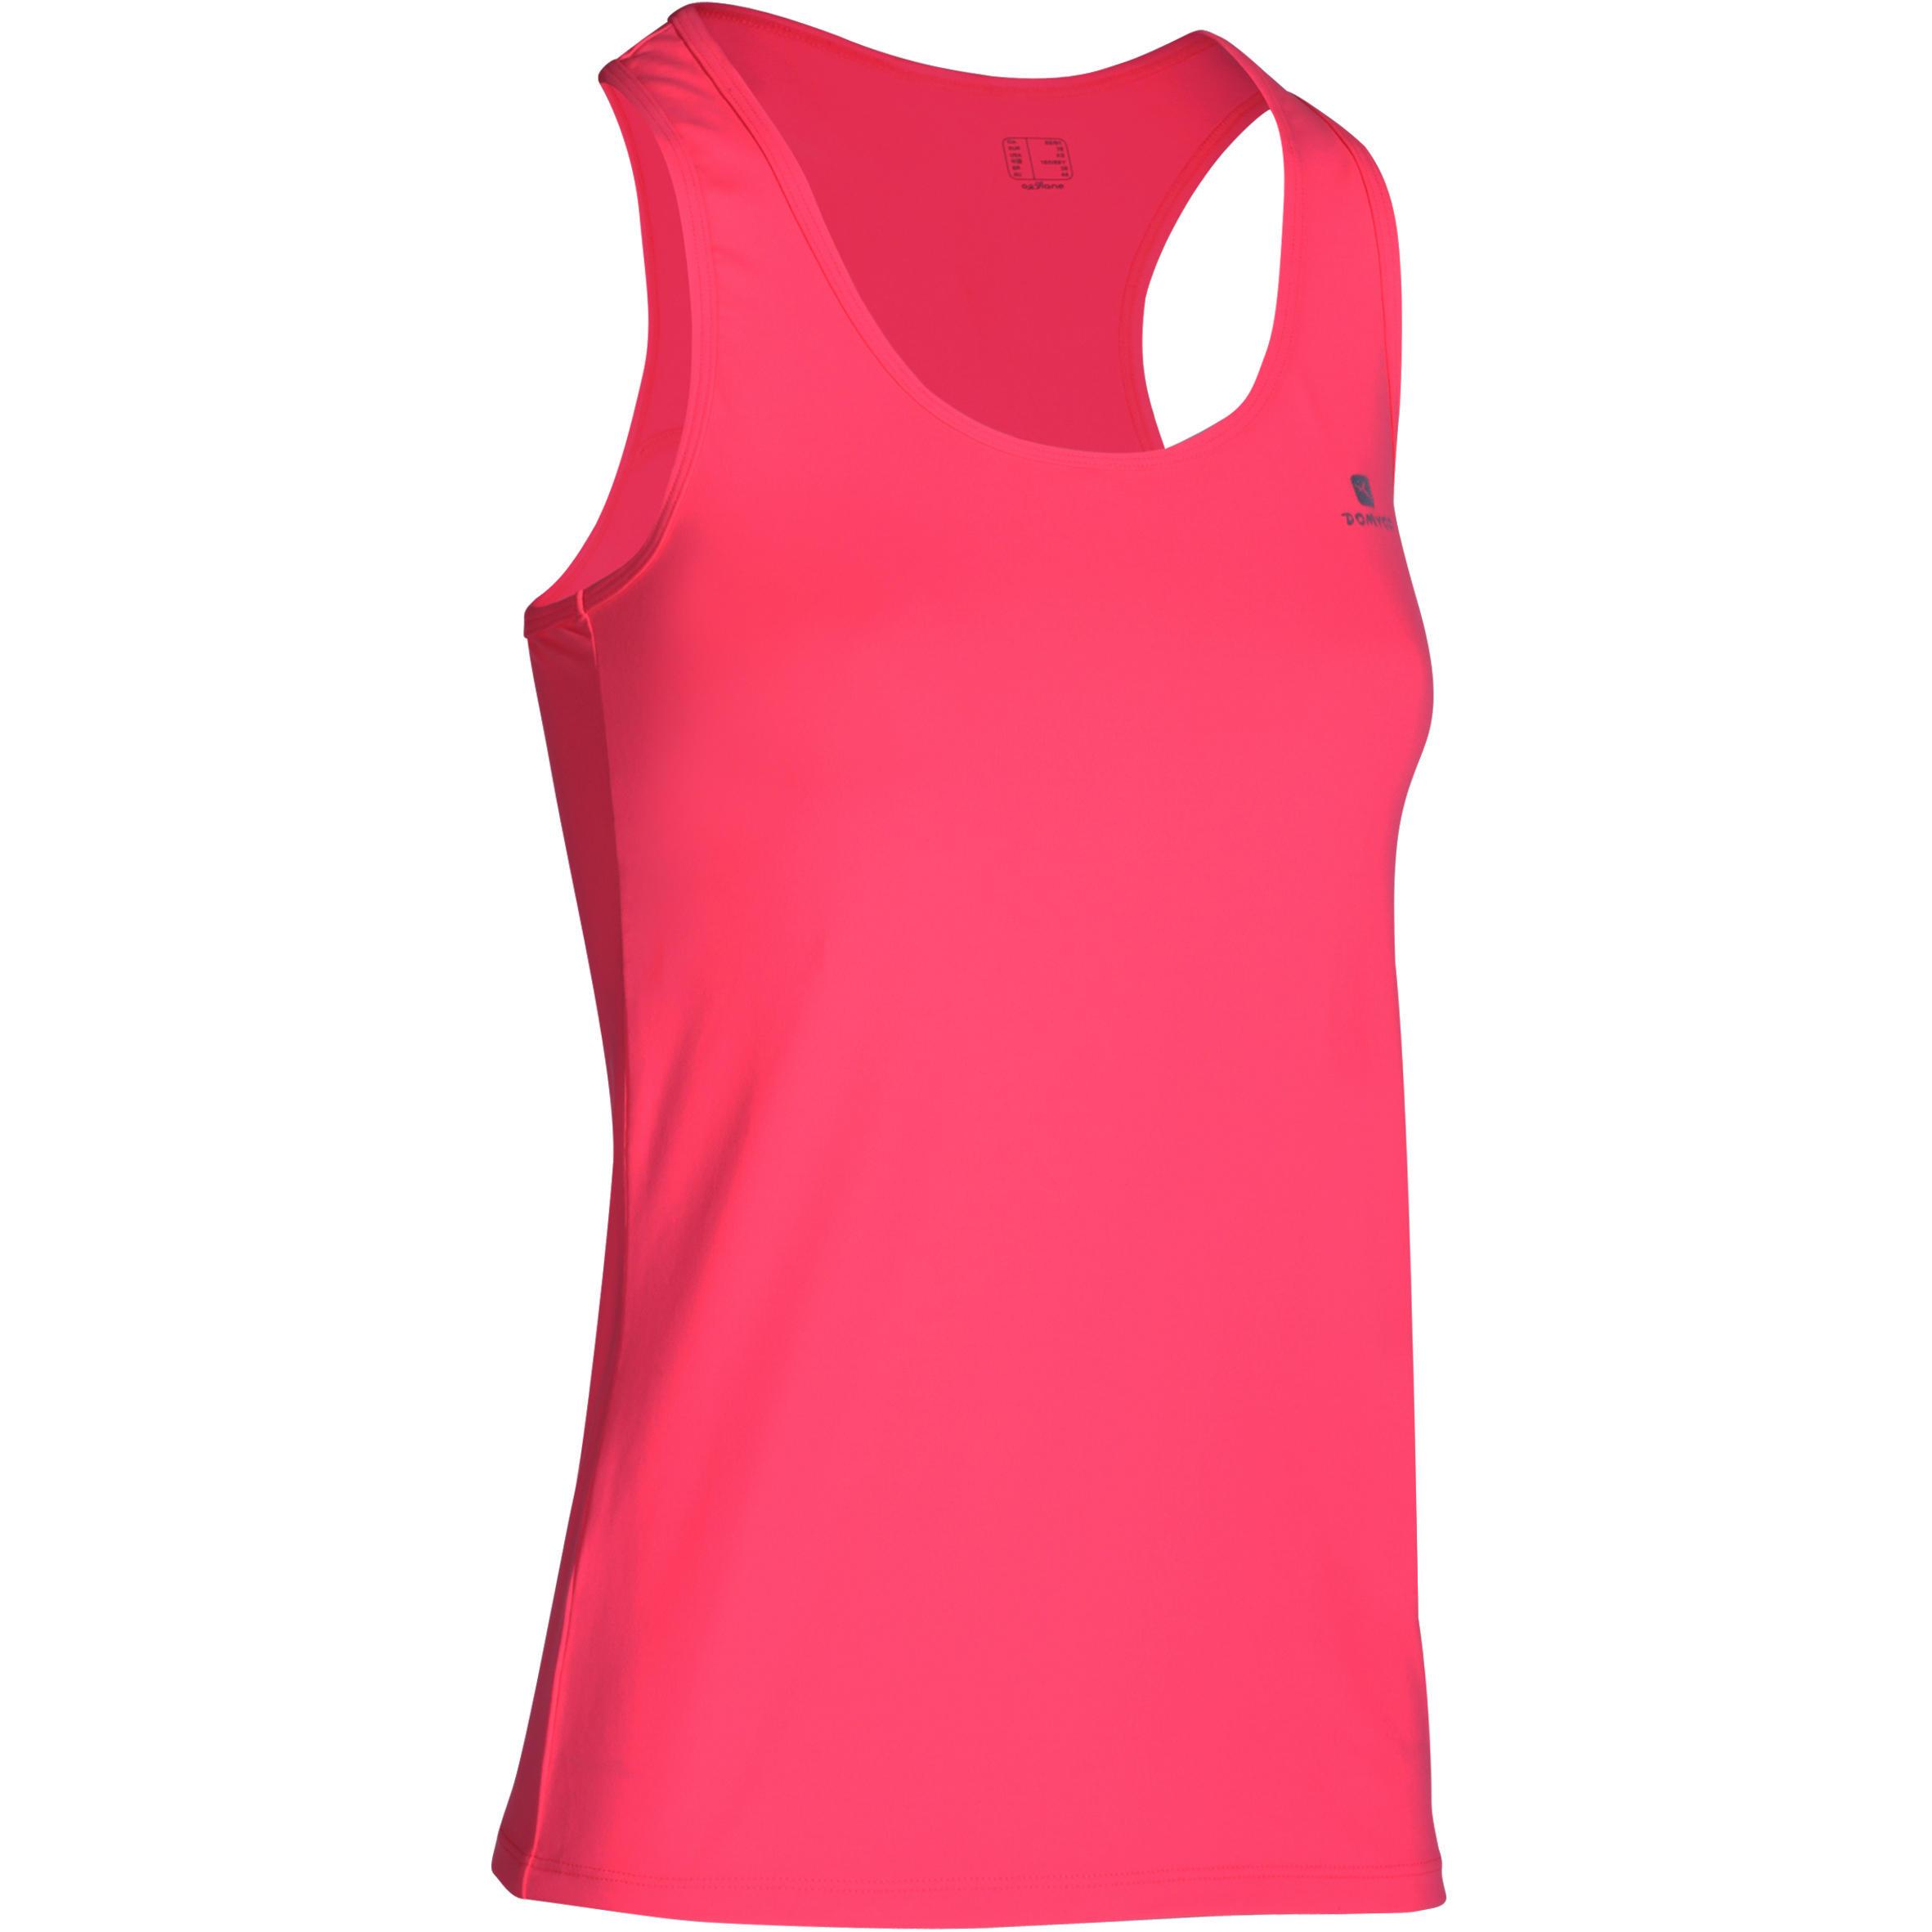 My Top 100 Fitness Cardio Damen rosa | Sportbekleidung > Sporttops | Rosa | Domyos